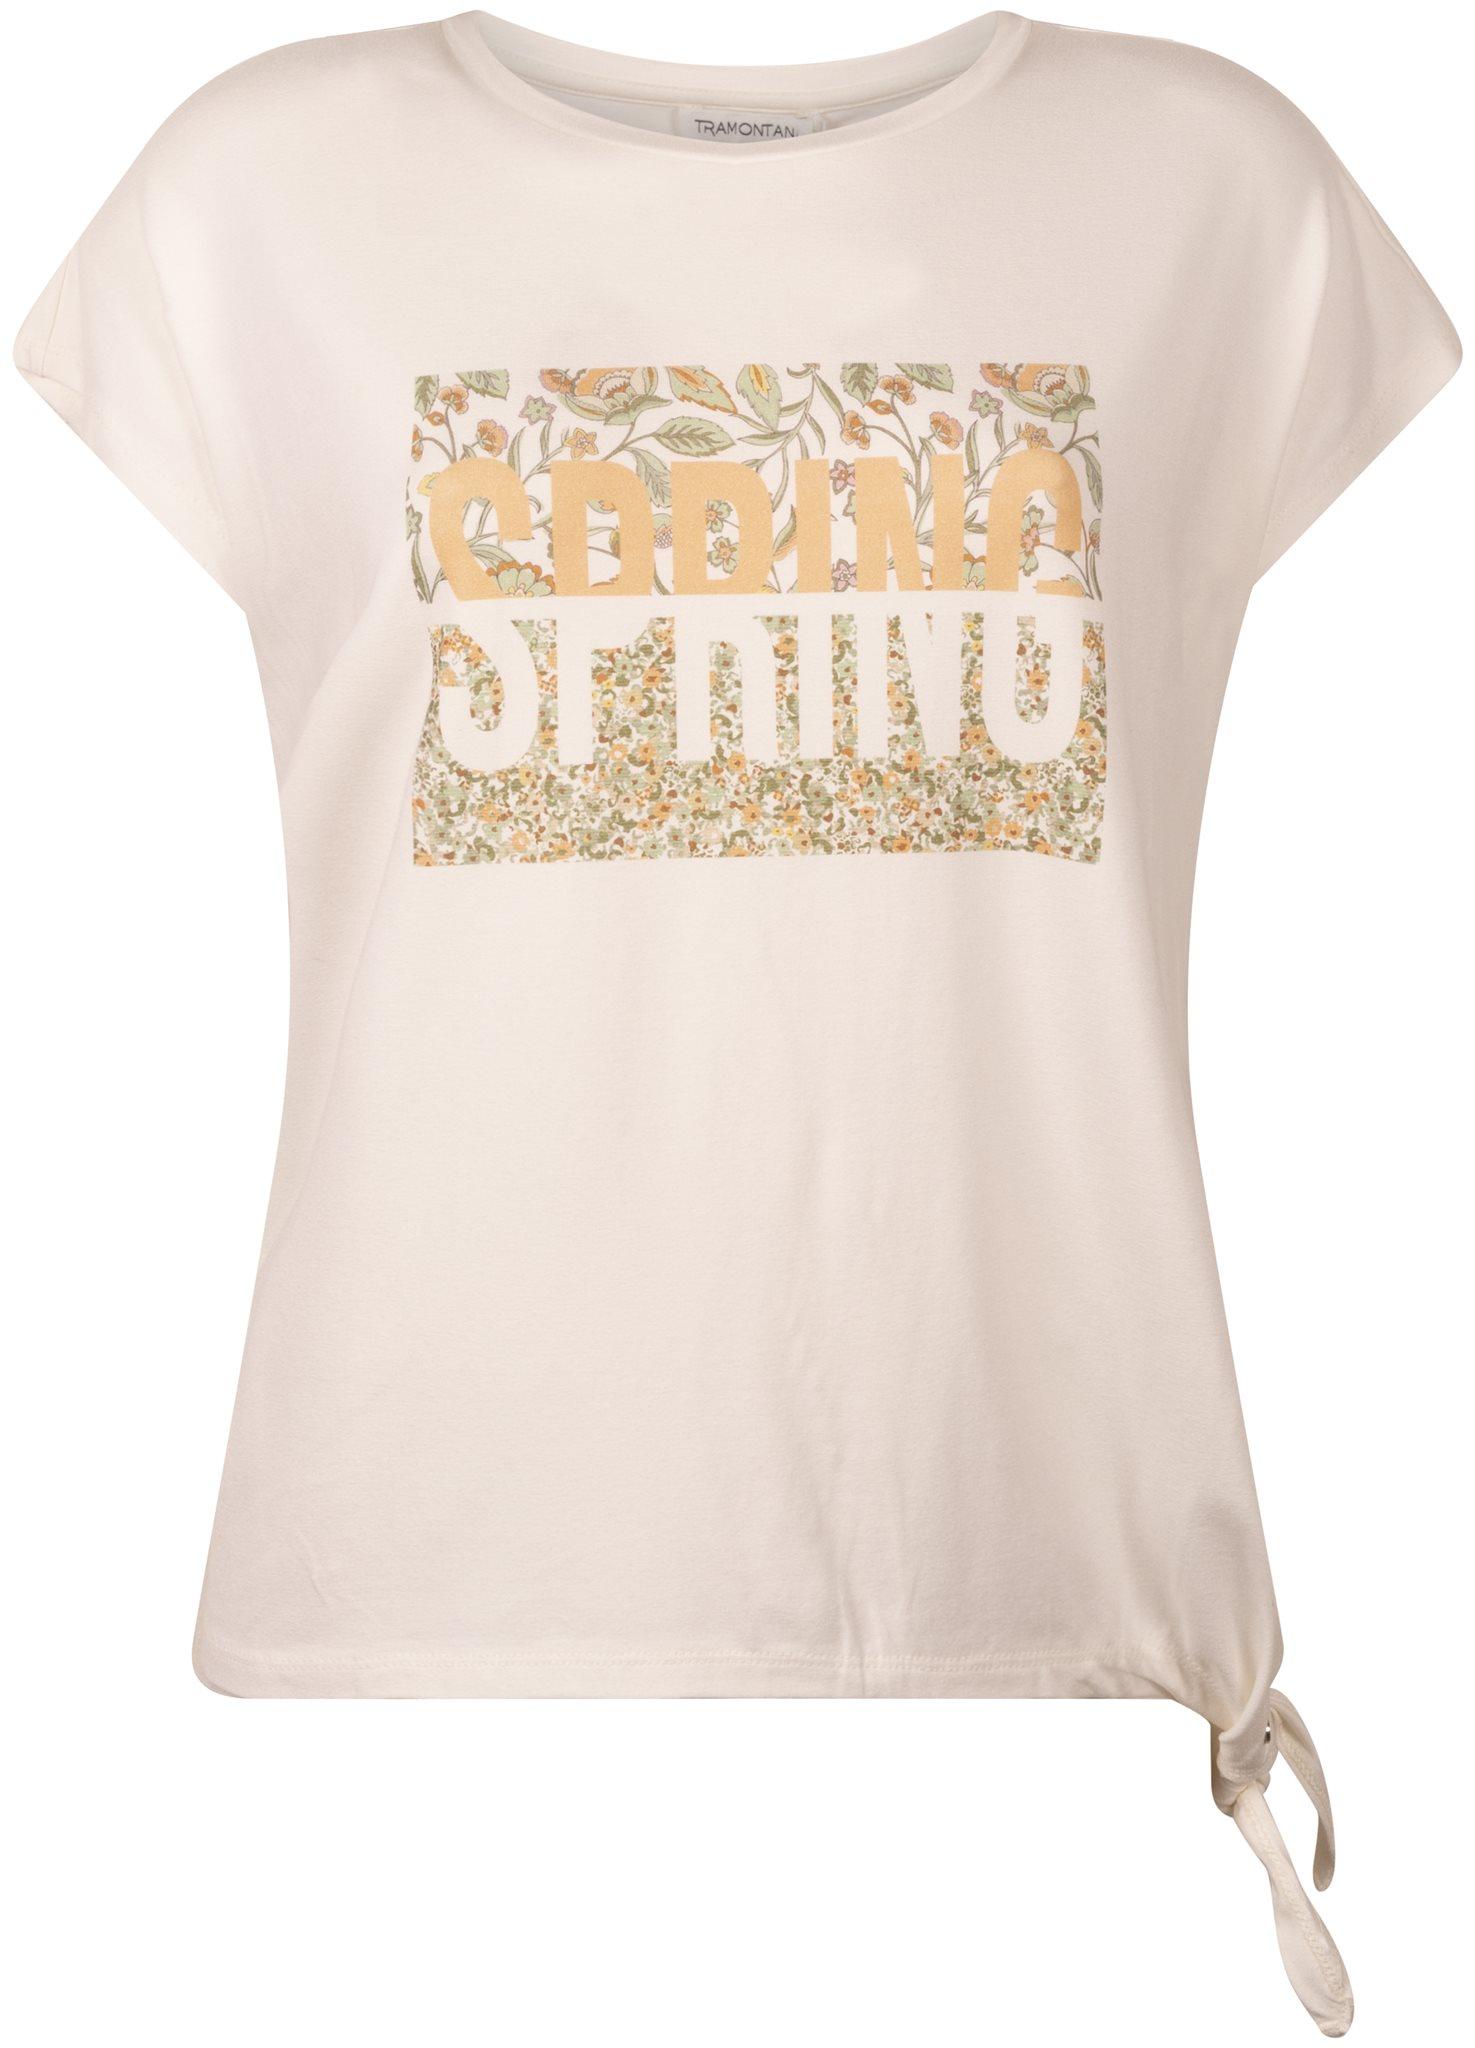 T-Shirt Petite Fleur